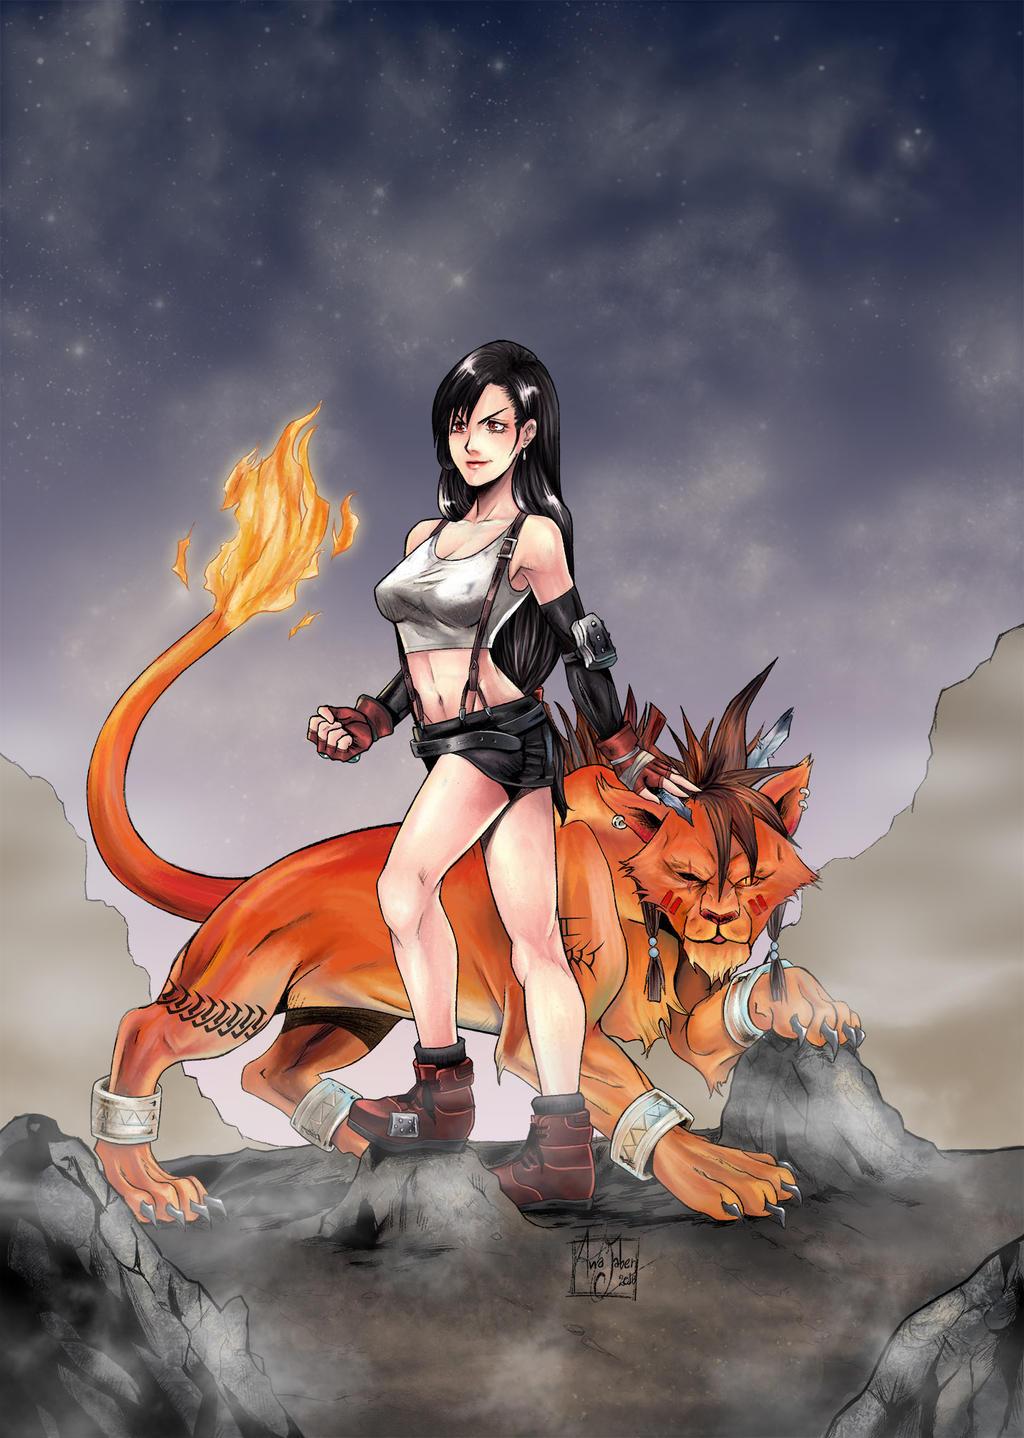 Sexy stana katic hot